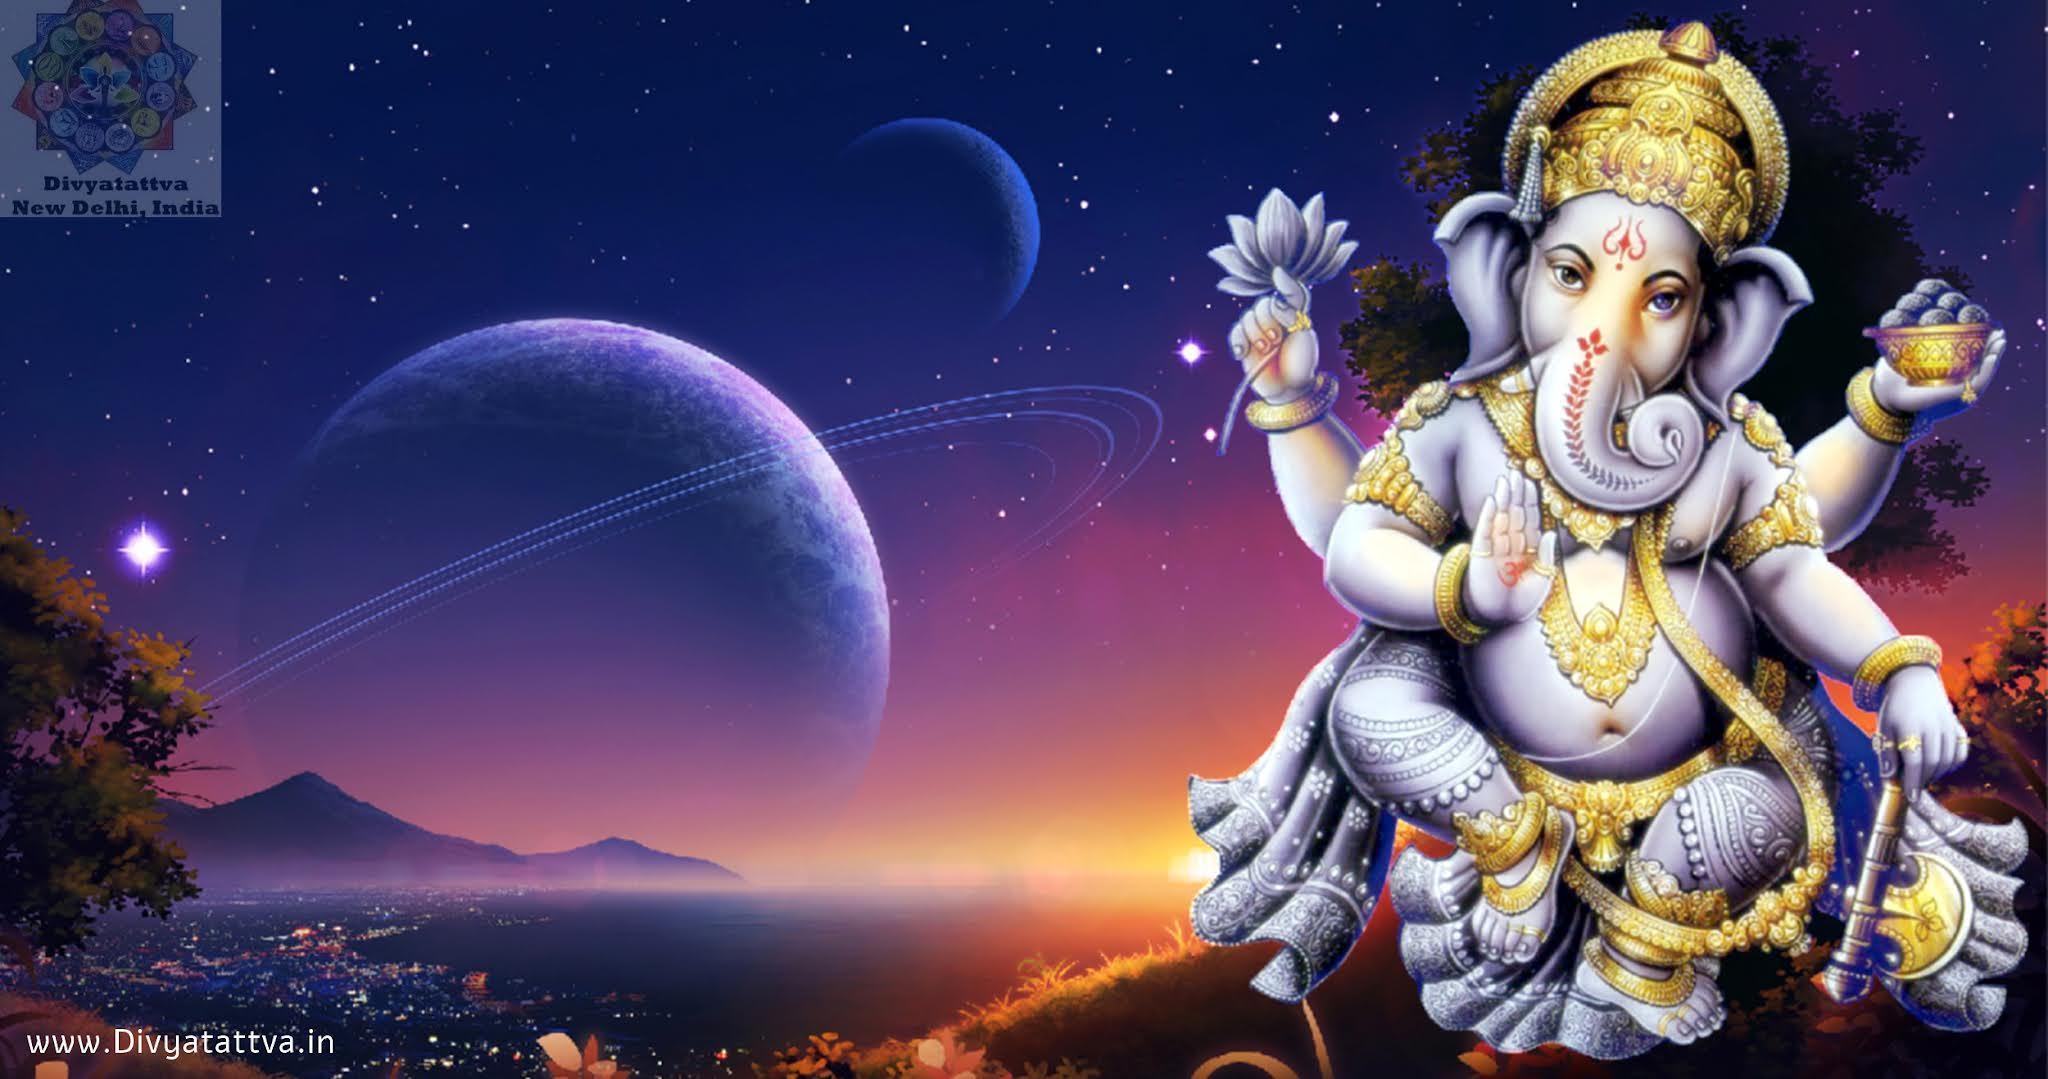 Lord Ganesha 3D Wallpapers, Siddhi Vinayak photos, Ganesh Chaturthi Pictures